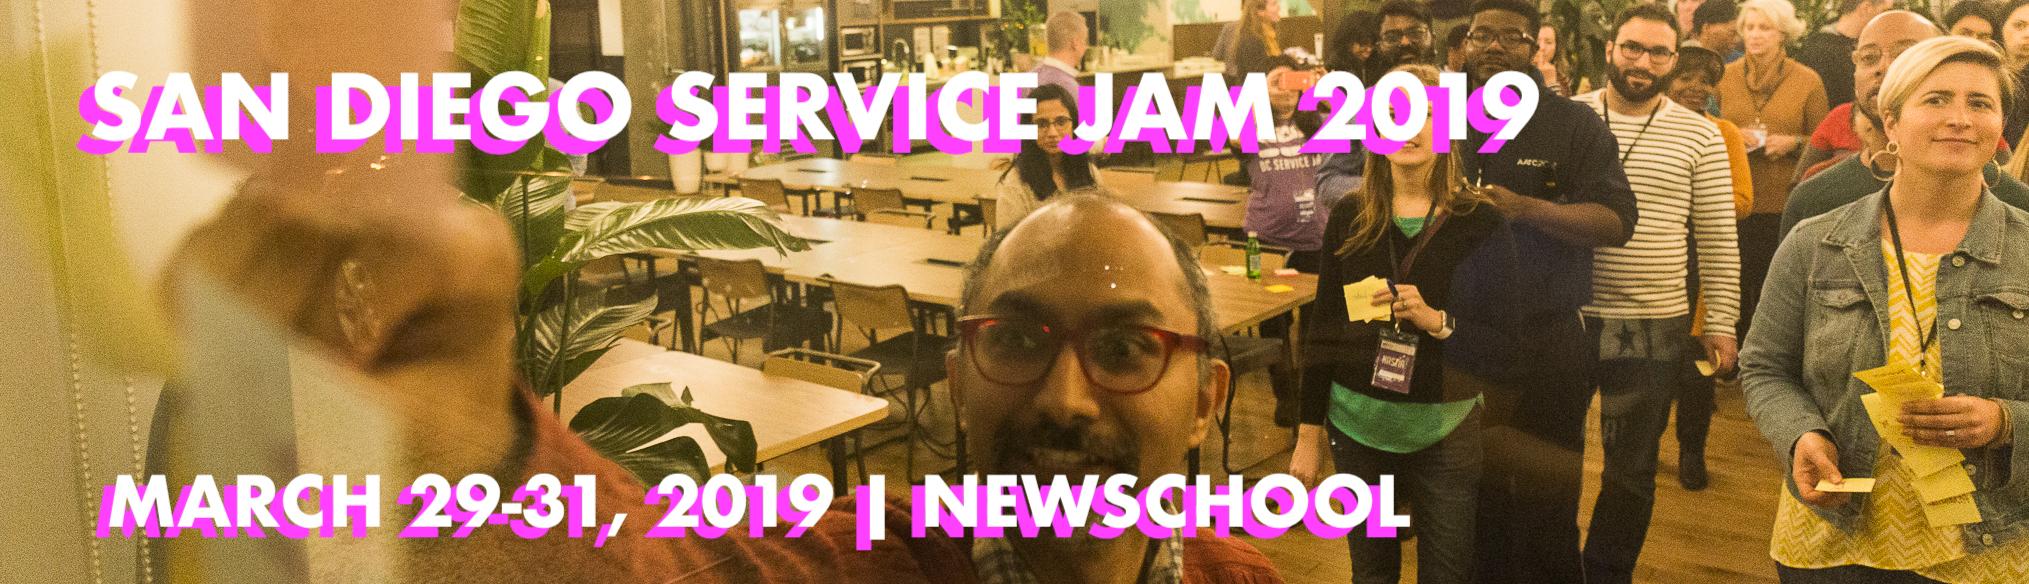 SD Service Jam 2019 Header.jpg